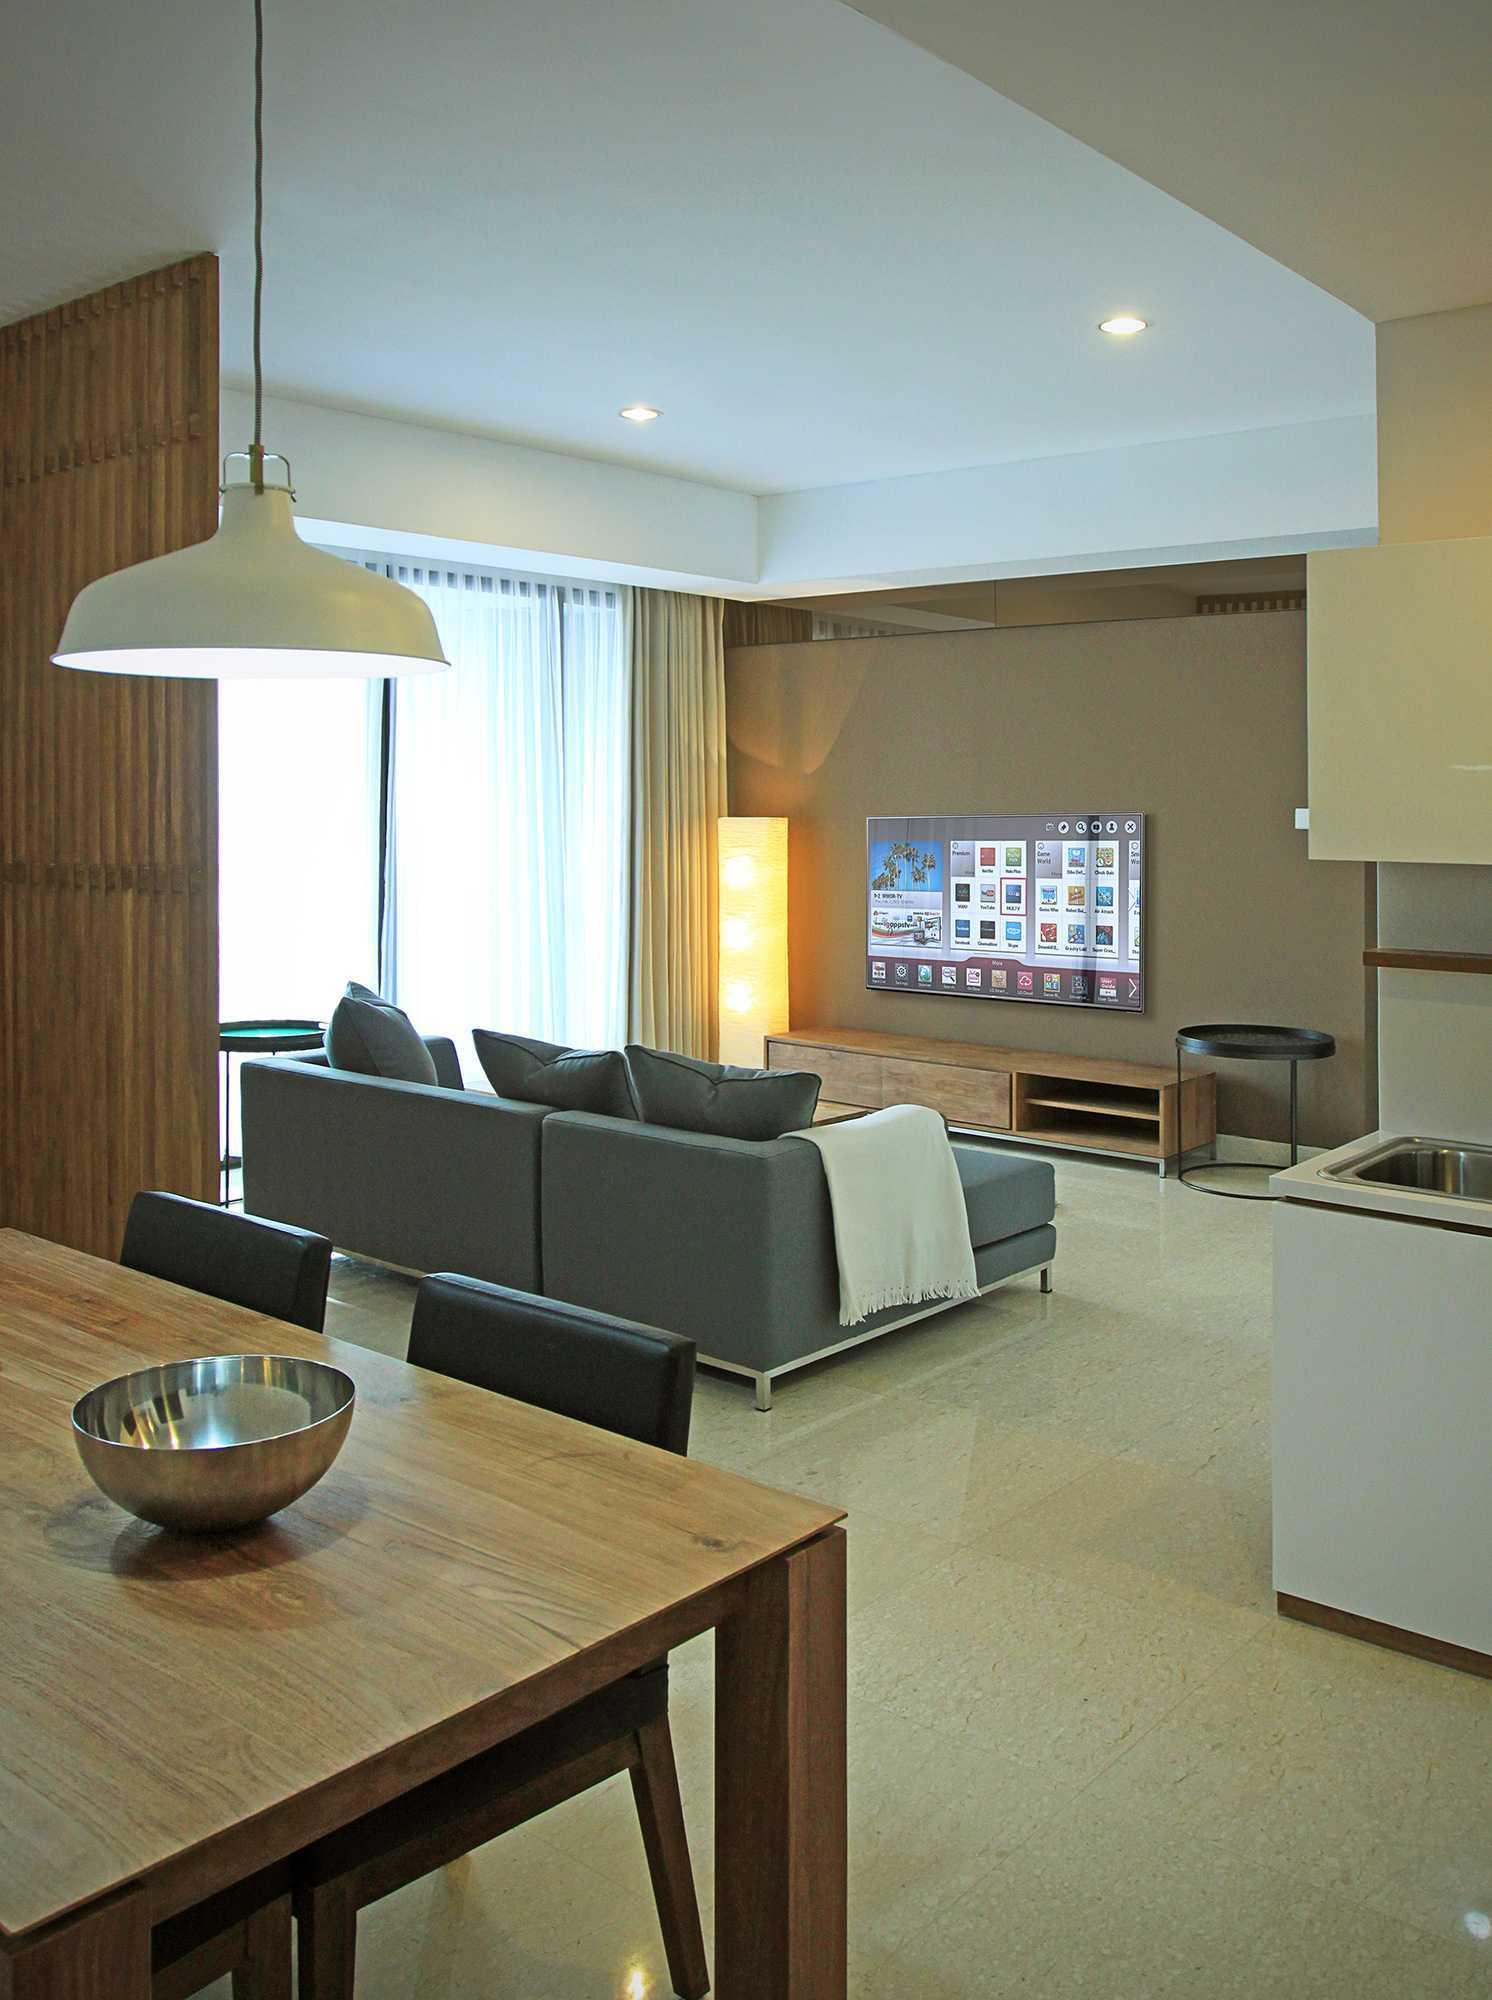 G+G Architect Studio 1 Park Avenue Jakarta, Daerah Khusus Ibukota Jakarta, Indonesia  1-Park-04   38324